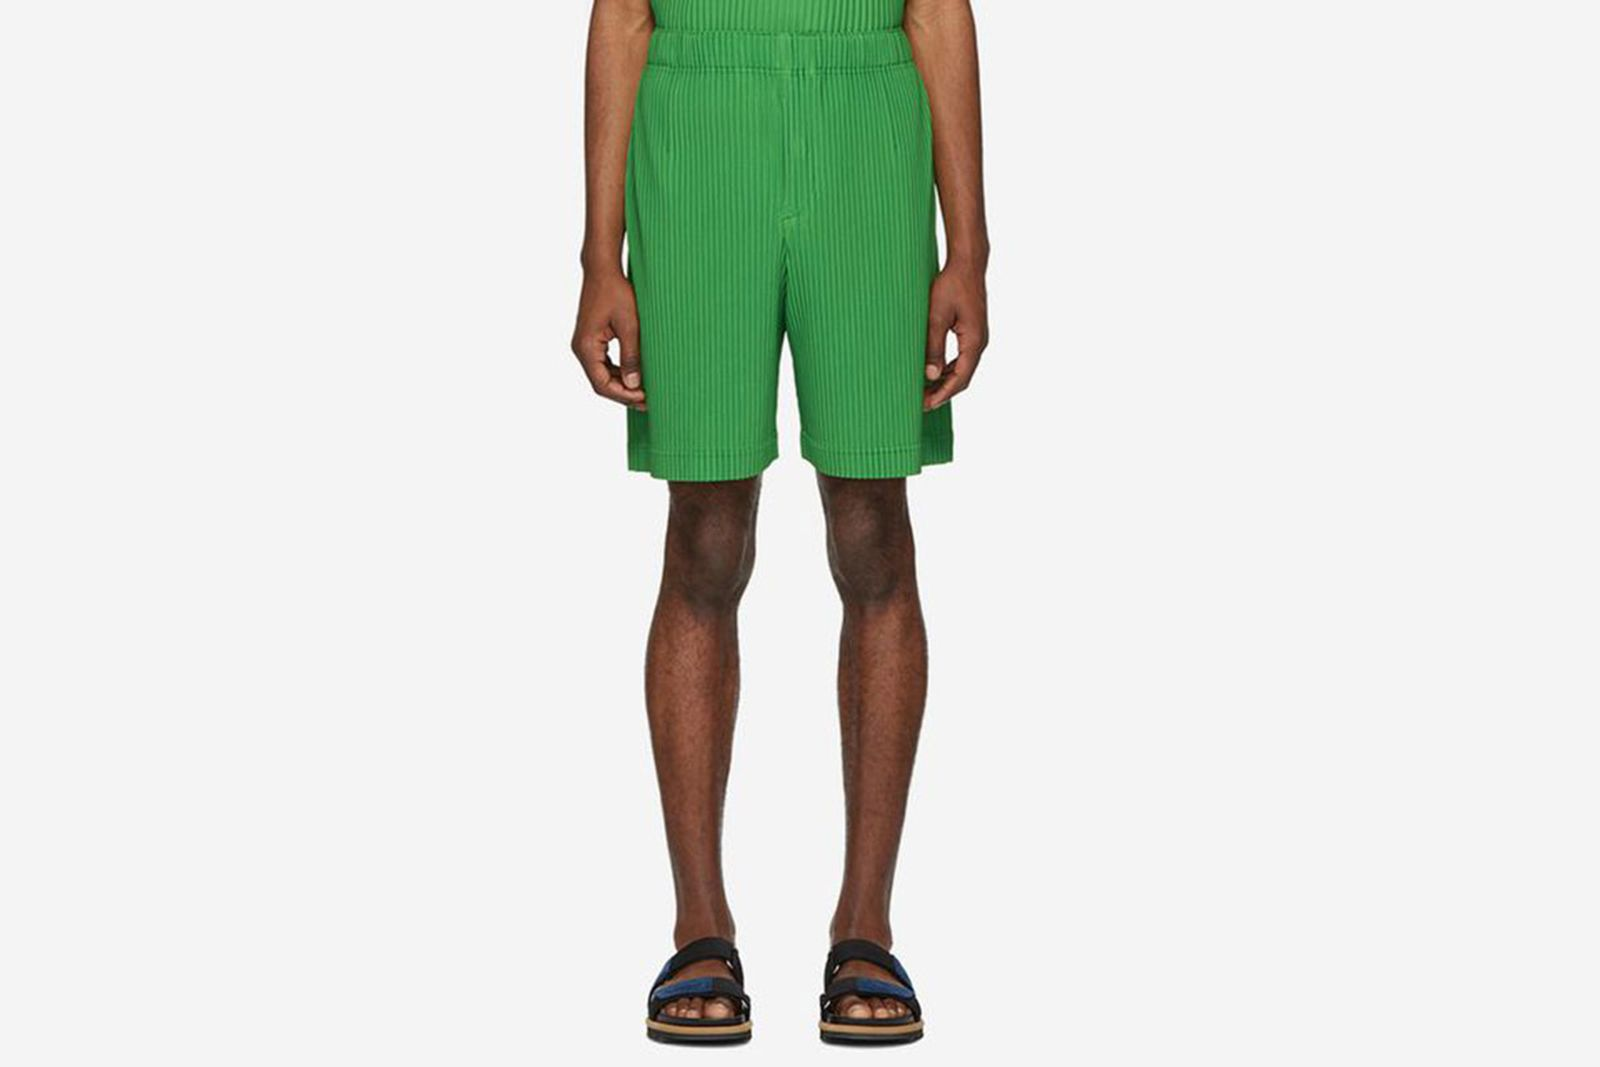 mens shorts 1017 ALYX 9SM ALCH Issey Miyake HOMME PLISSÉ